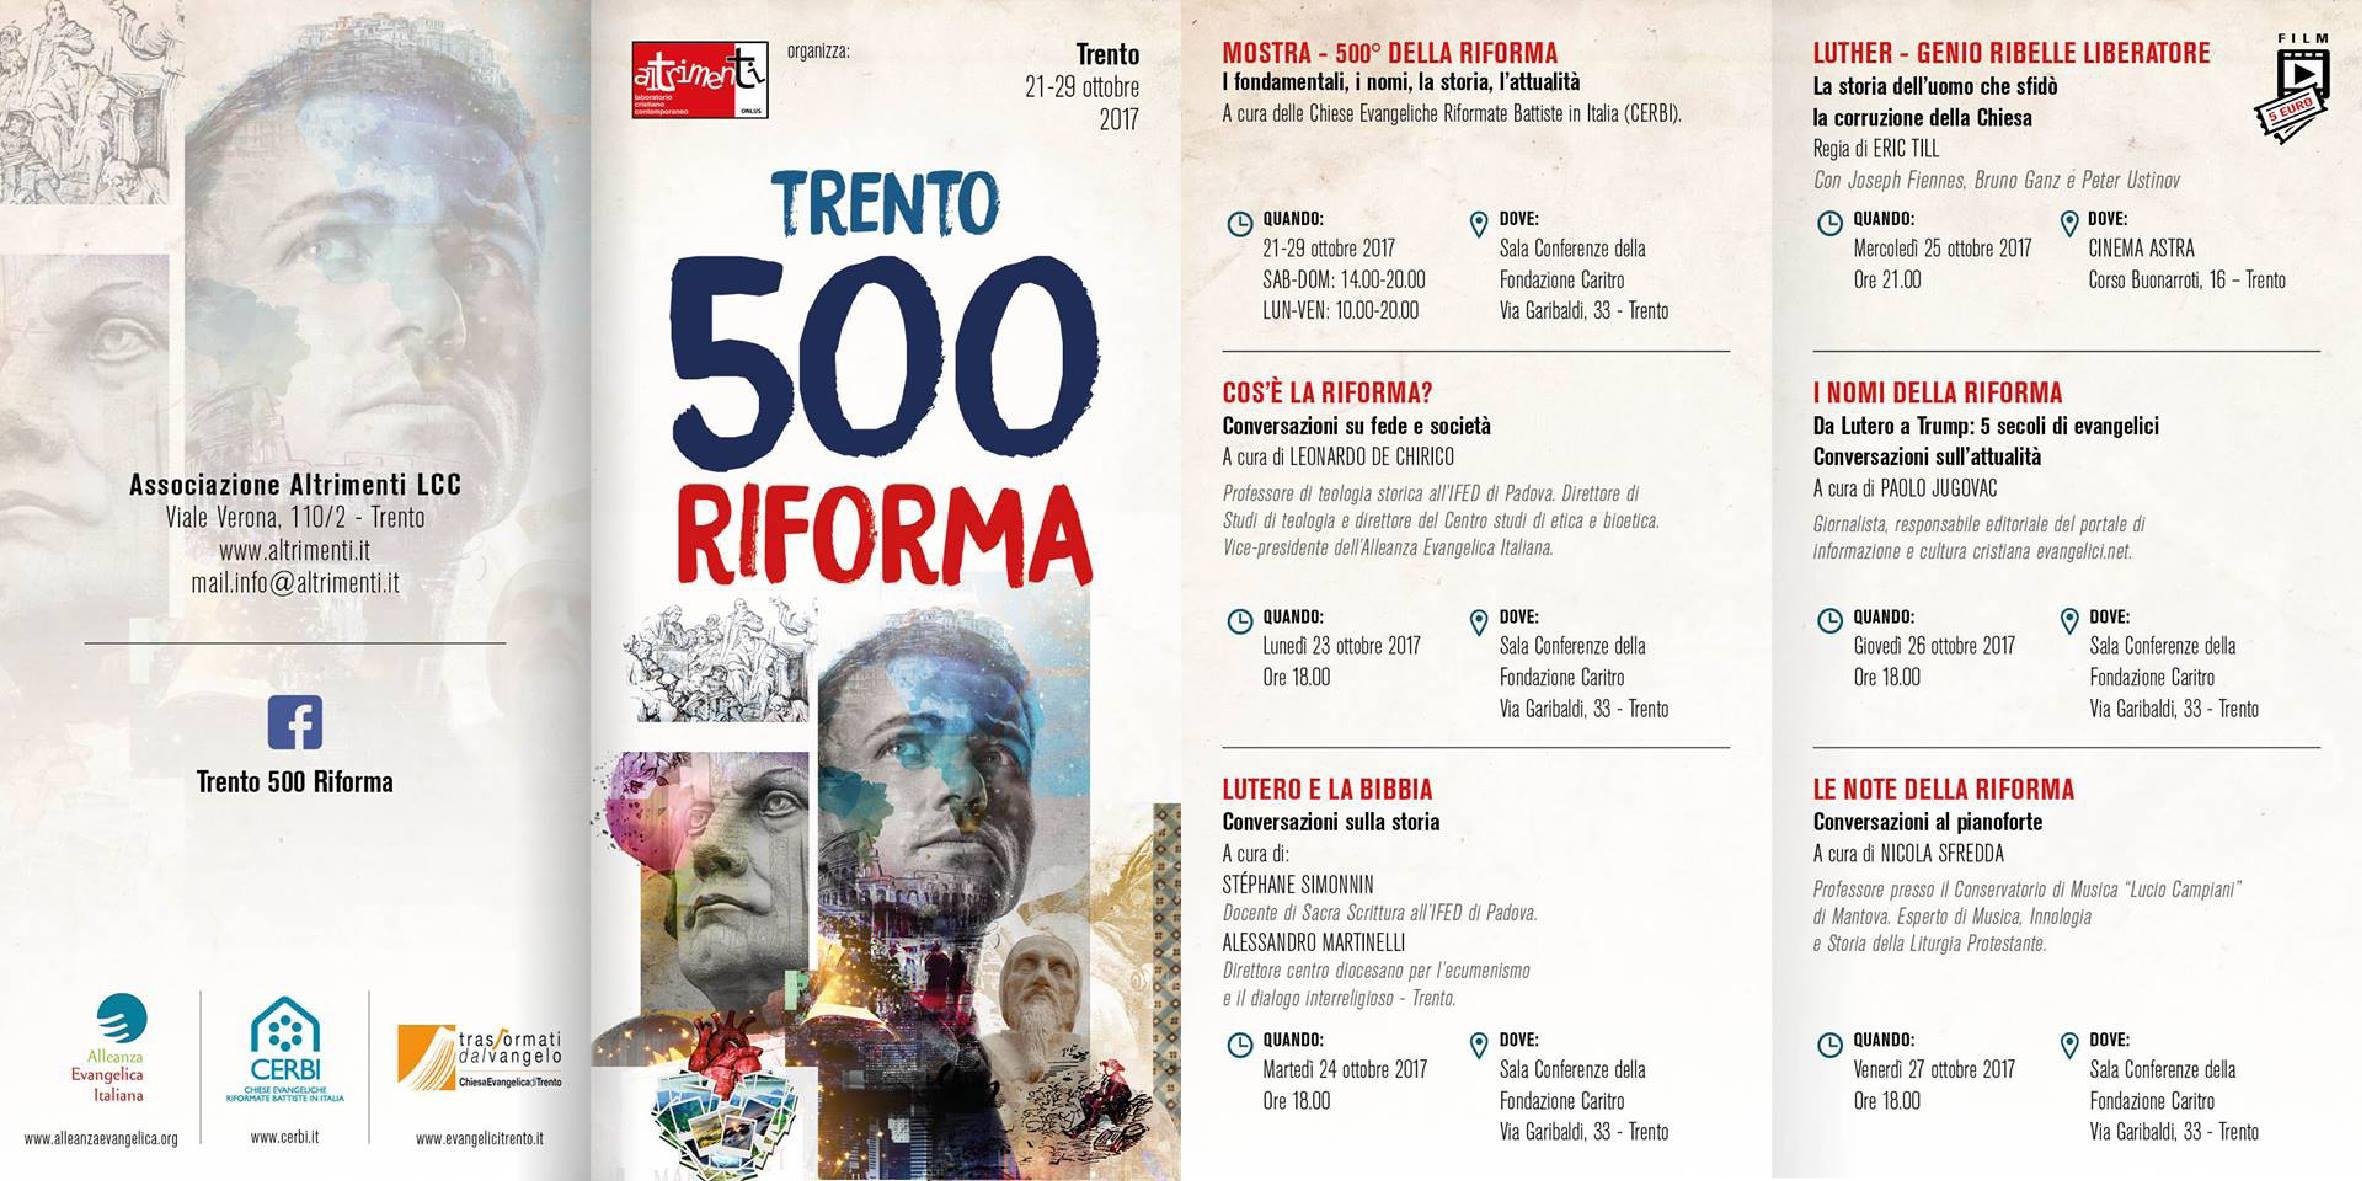 Riforma 500